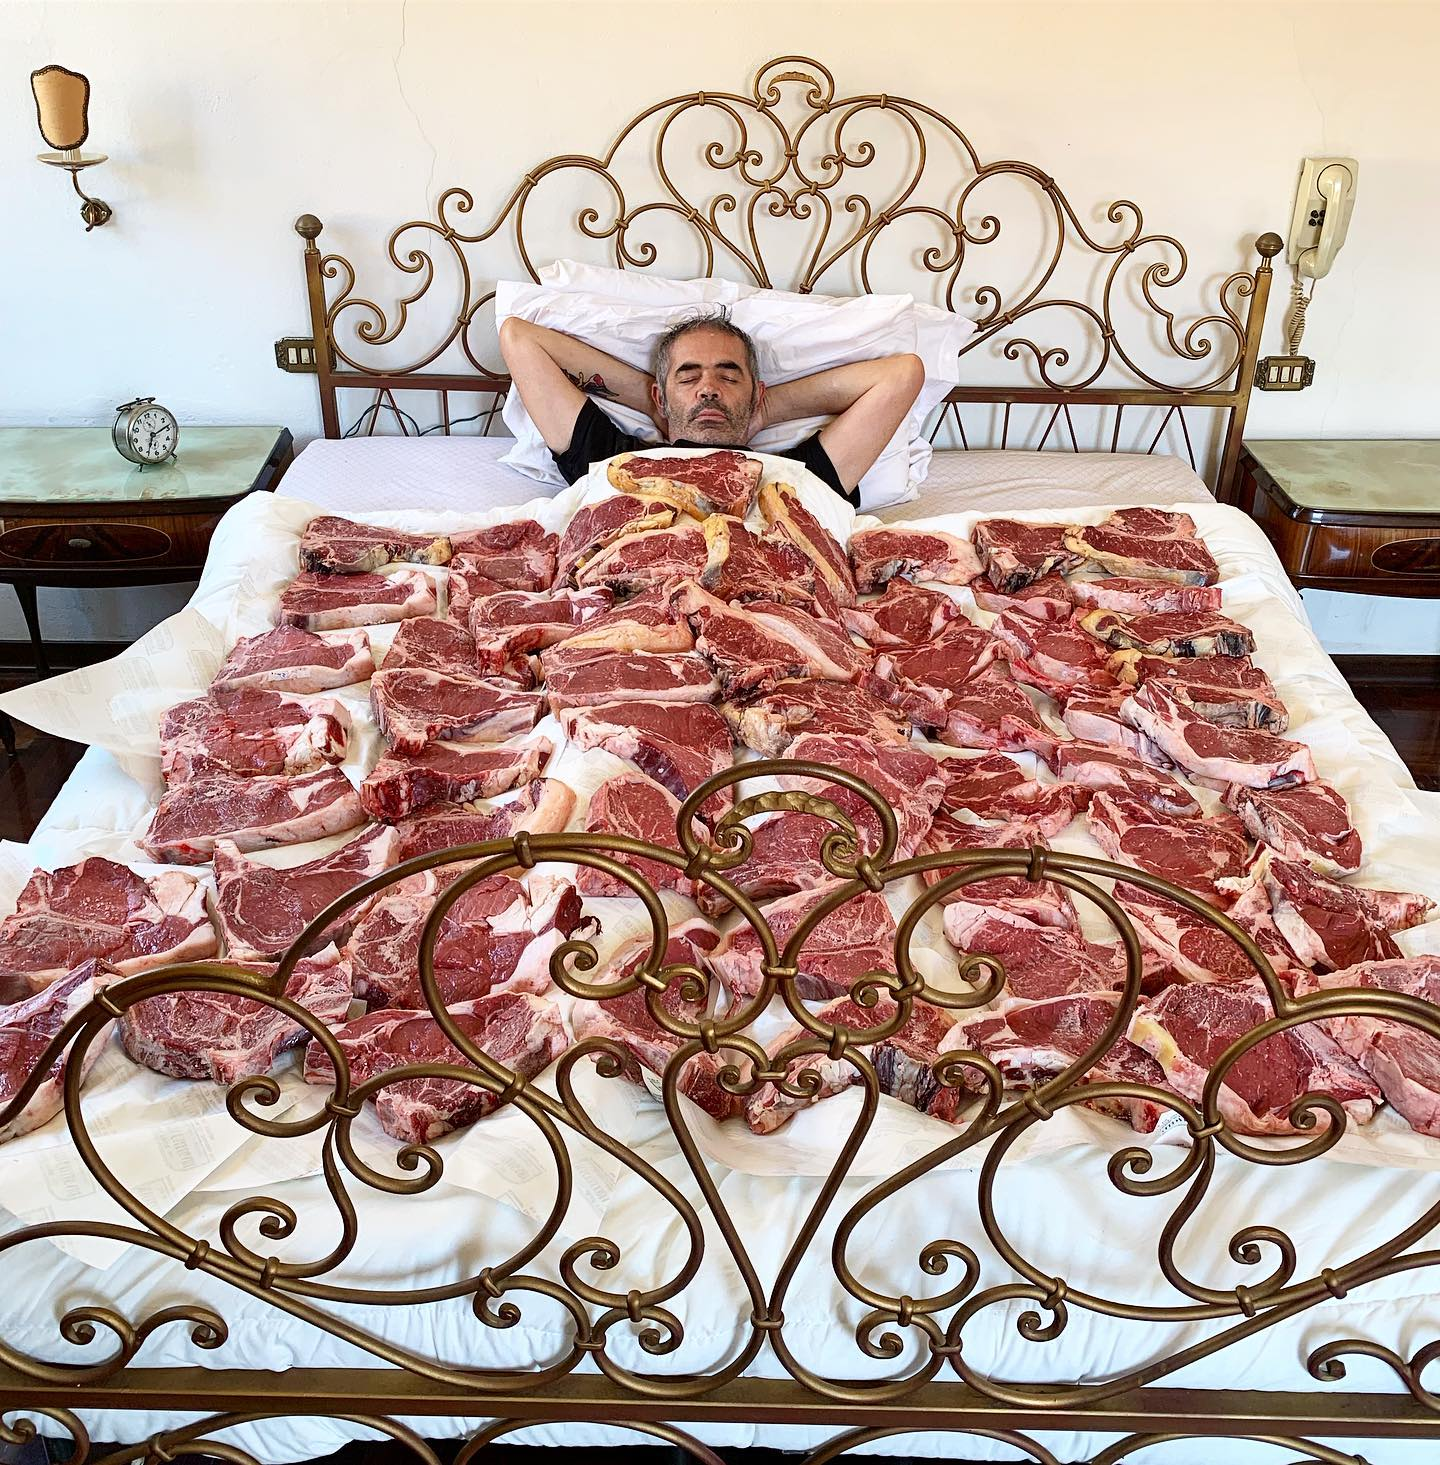 the butcher piacenza